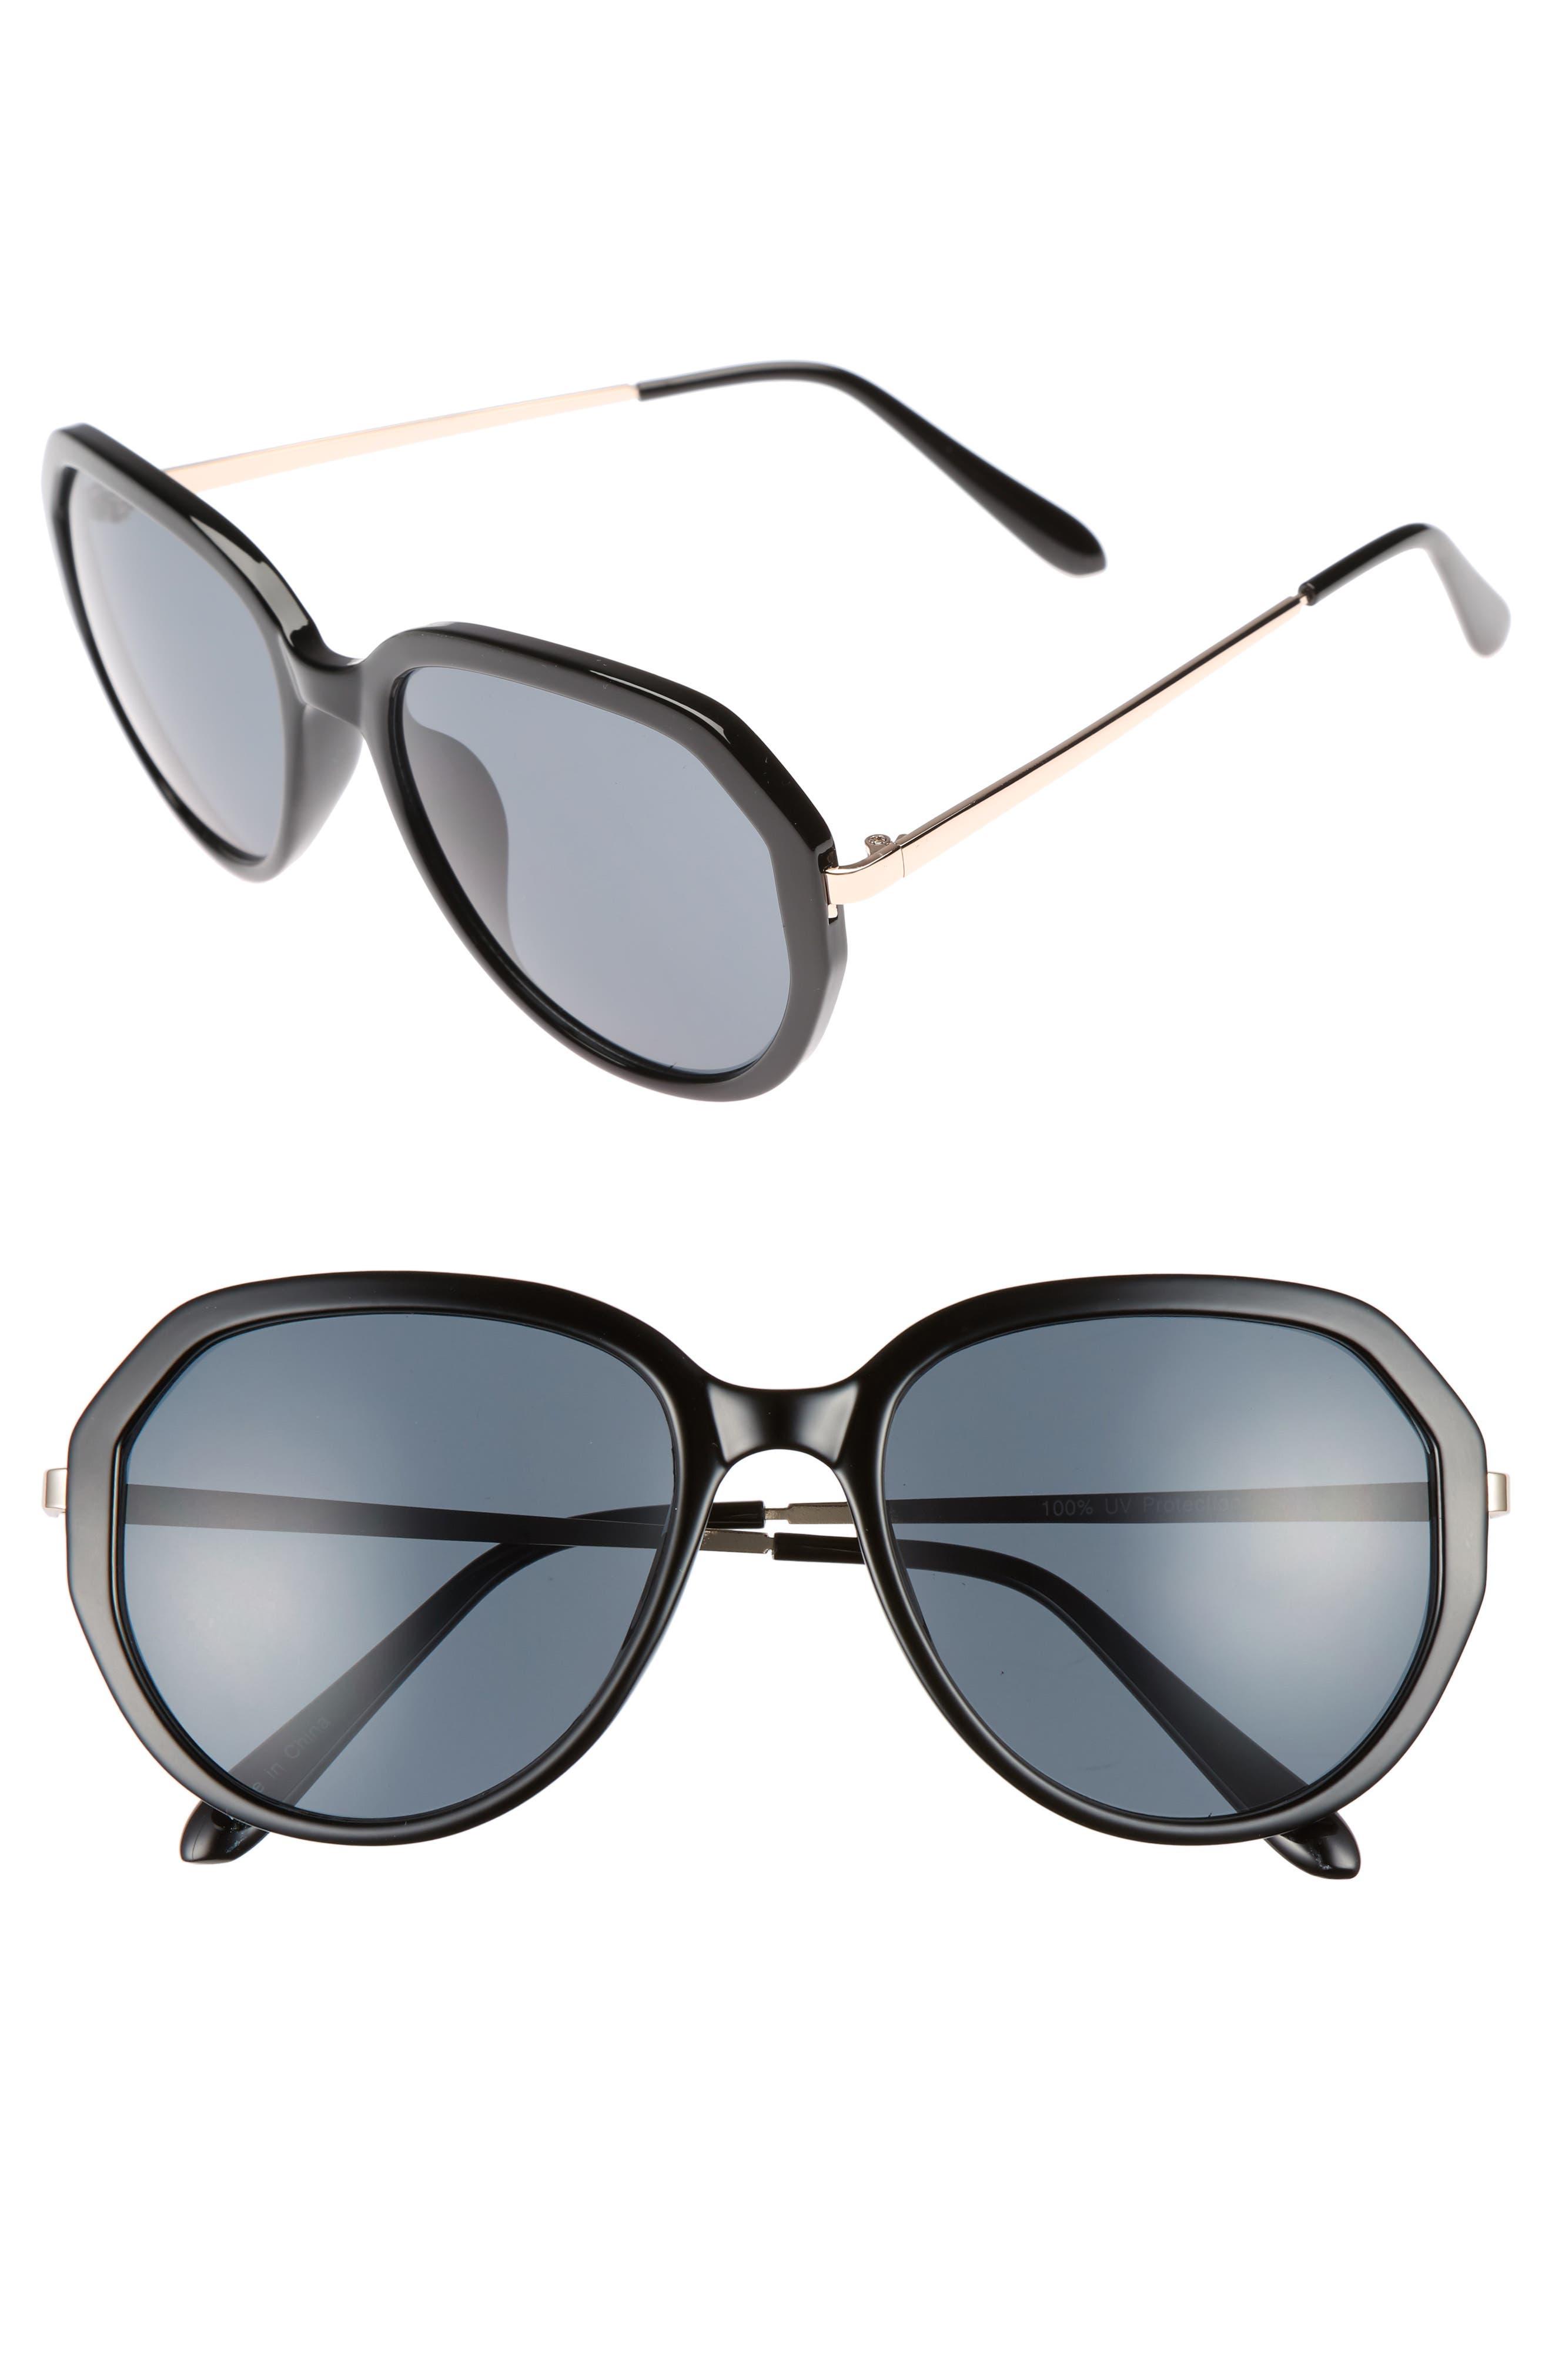 60mm Geo Round Sunglasses,                         Main,                         color, Black/ Black